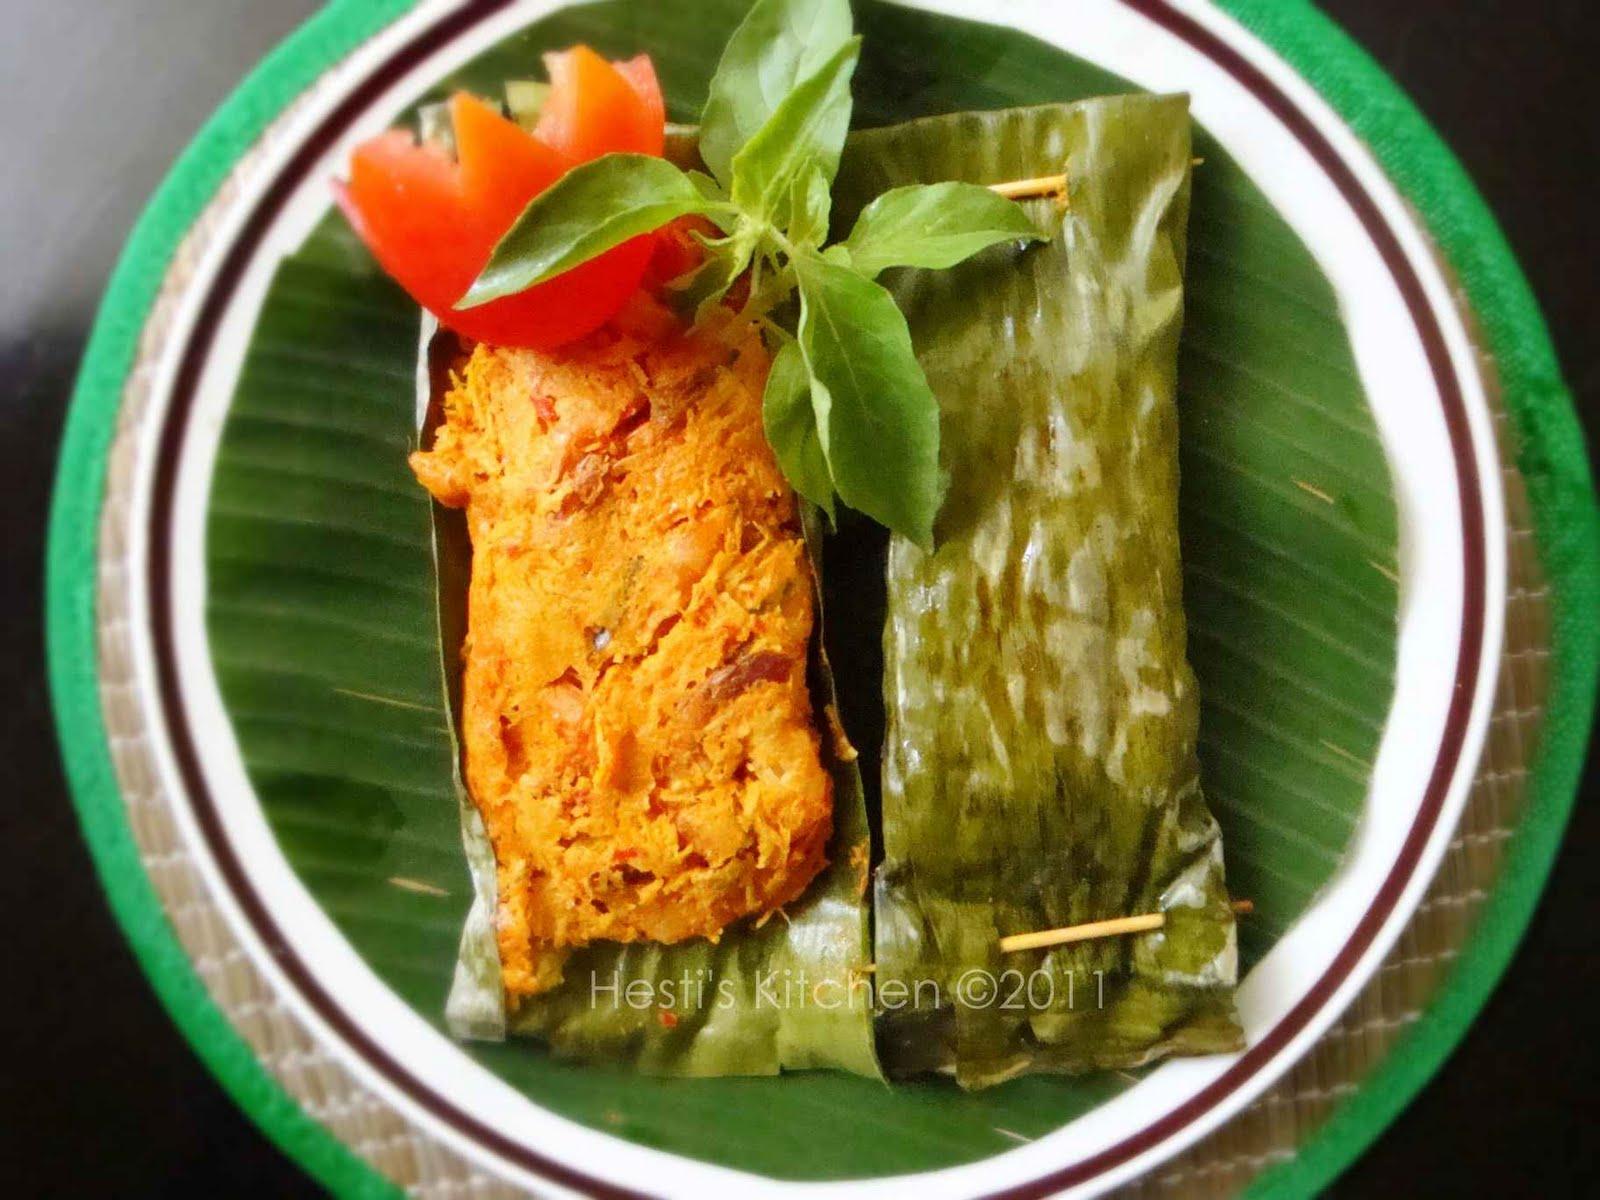 Resep Cake Kukus Hesti Kitchen: HESTI'S KITCHEN : Yummy For Your Tummy: Pepes Udang